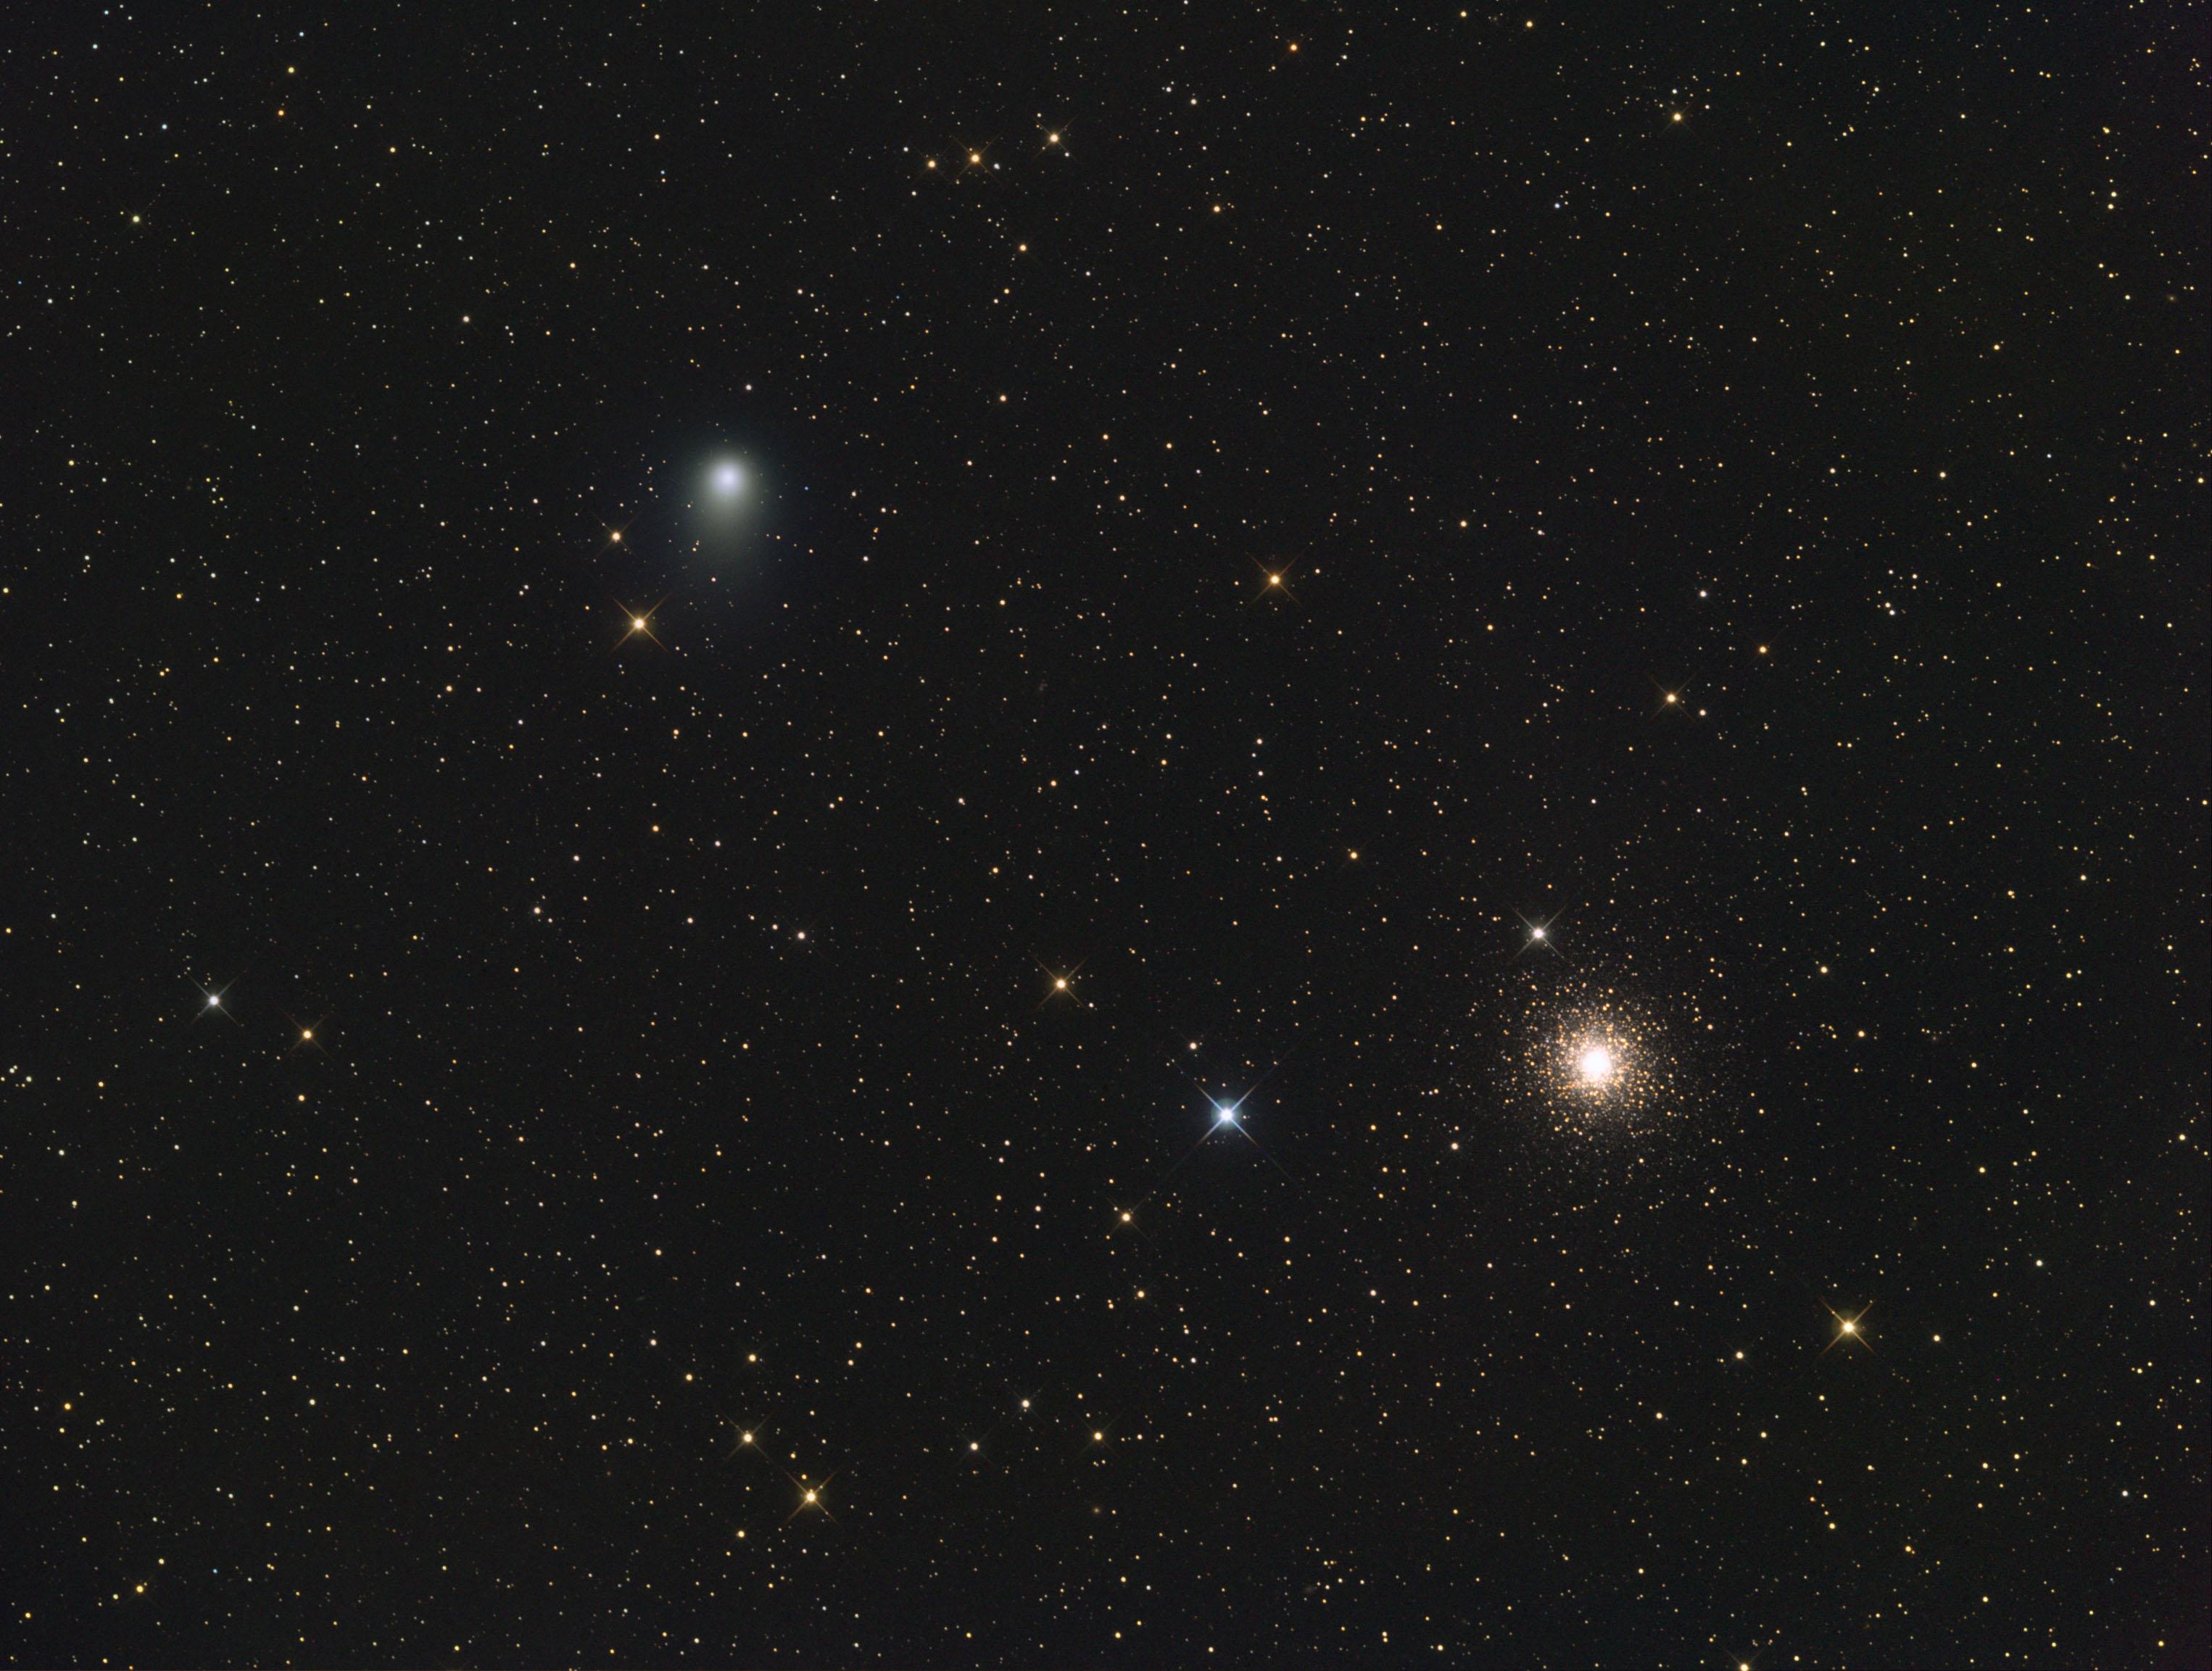 Apod 2011 August 6 Comet Garradd And Messier 15